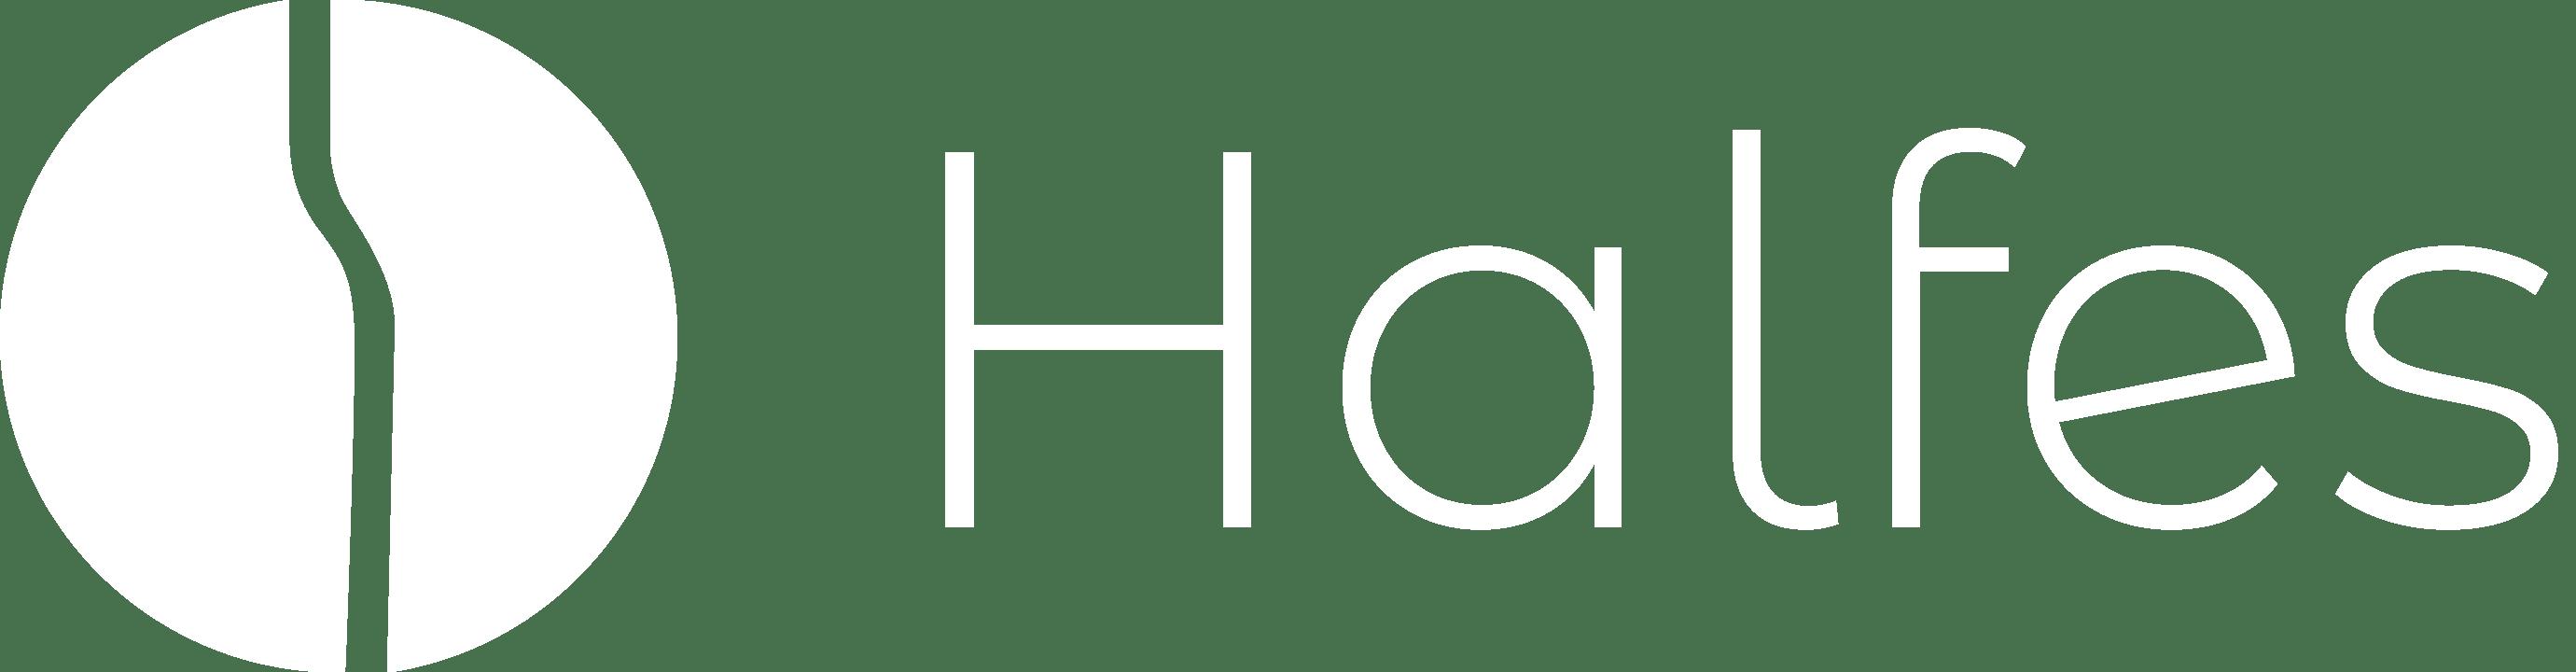 Halfes